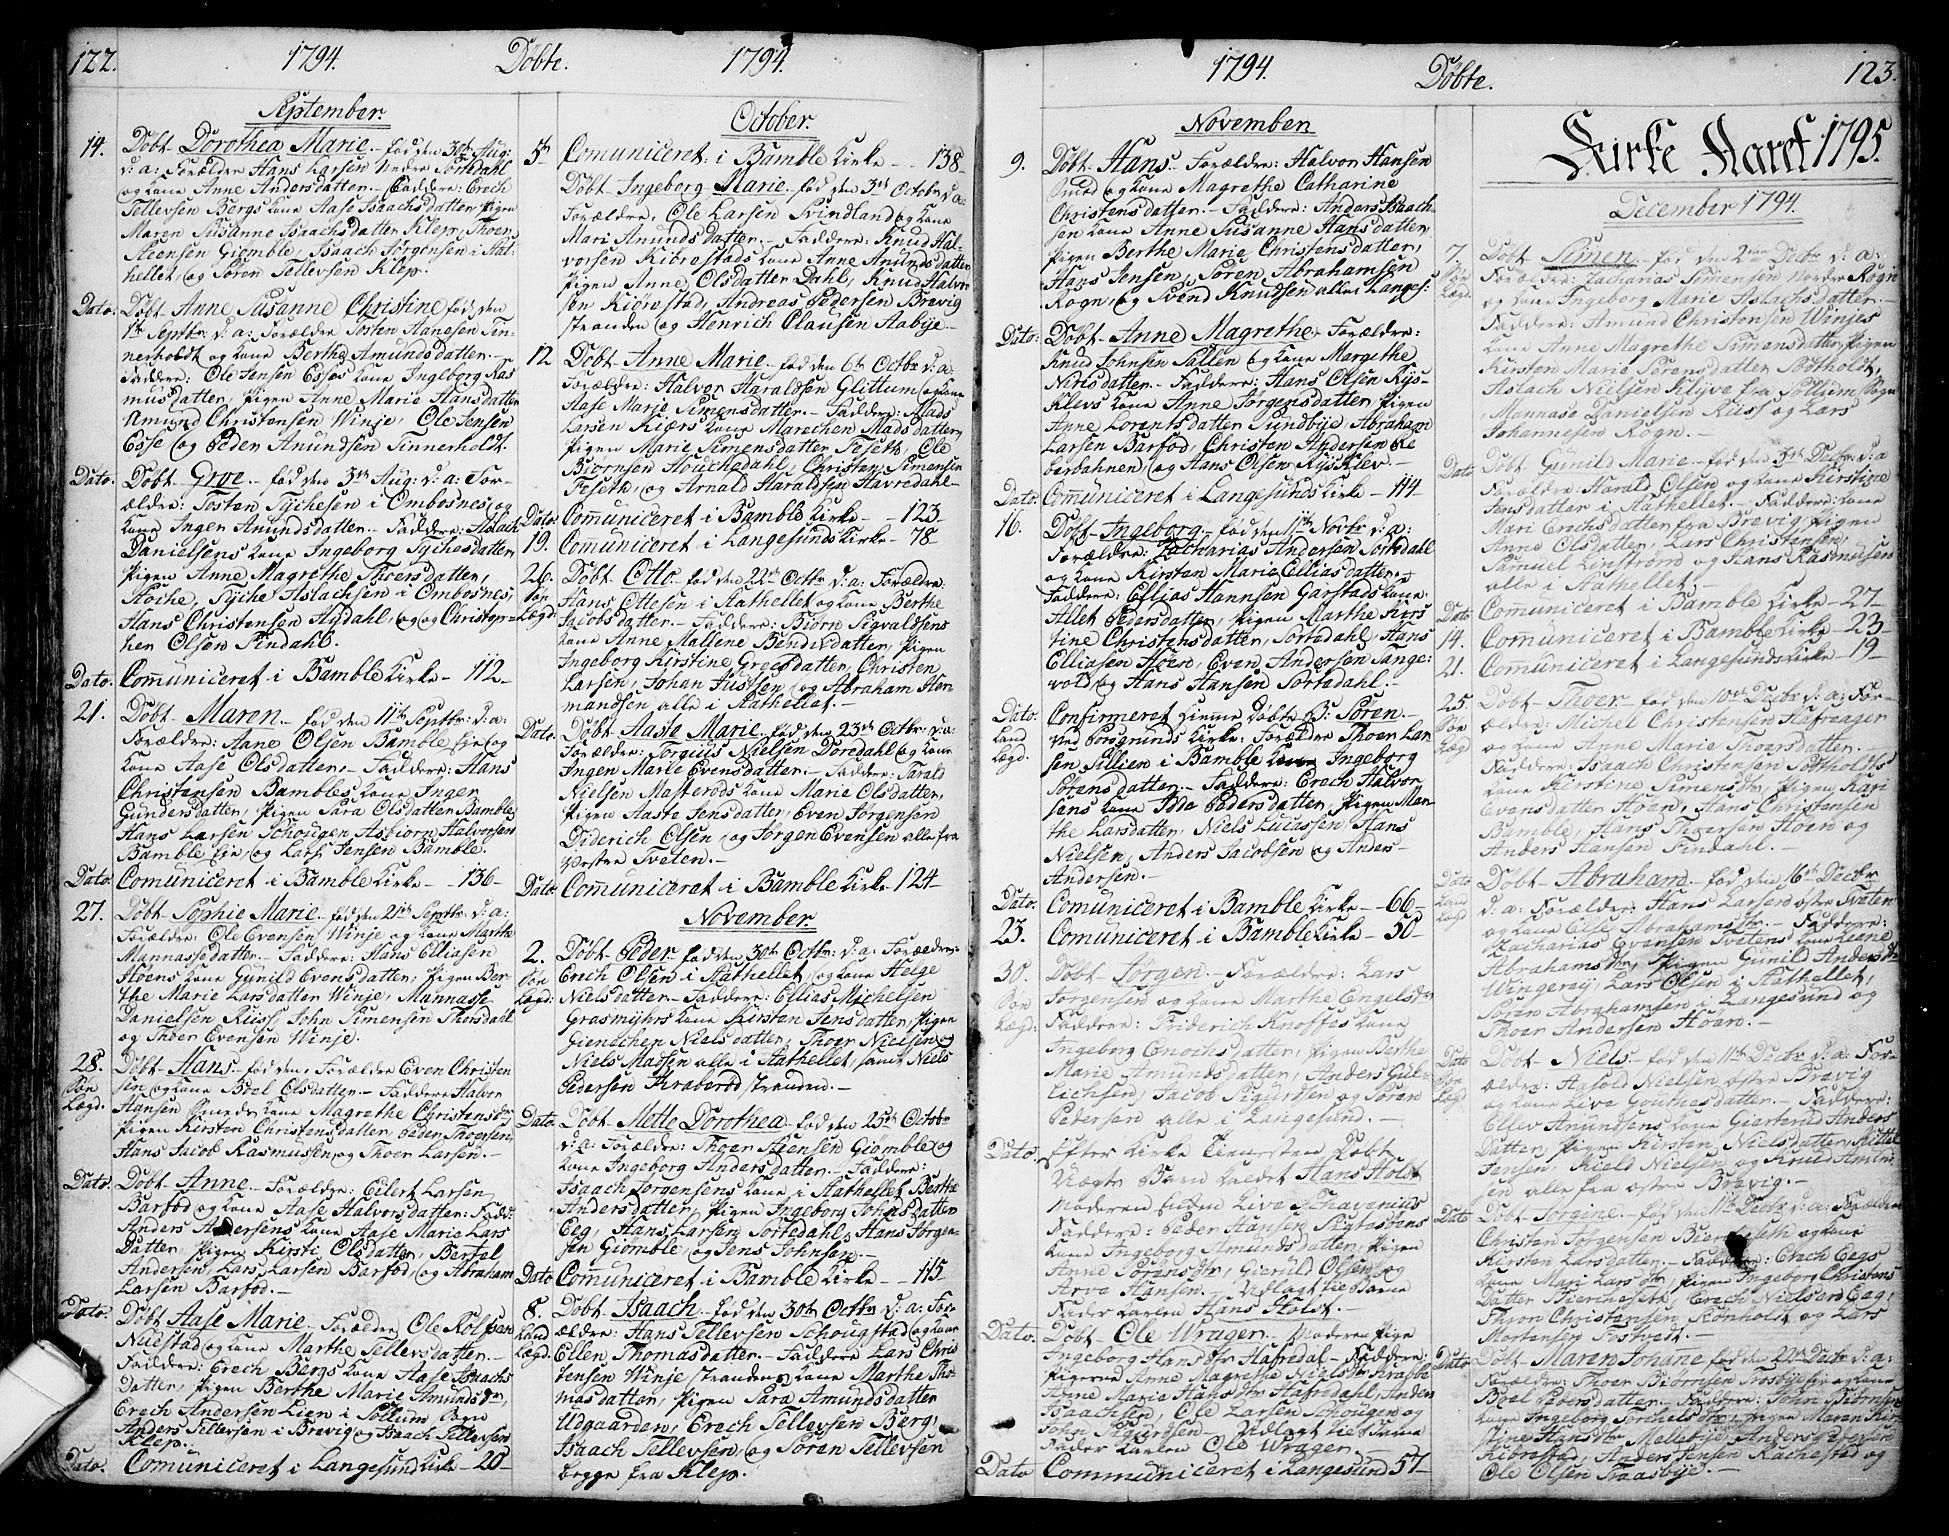 SAKO, Bamble kirkebøker, F/Fa/L0002: Ministerialbok nr. I 2, 1775-1814, s. 122-123